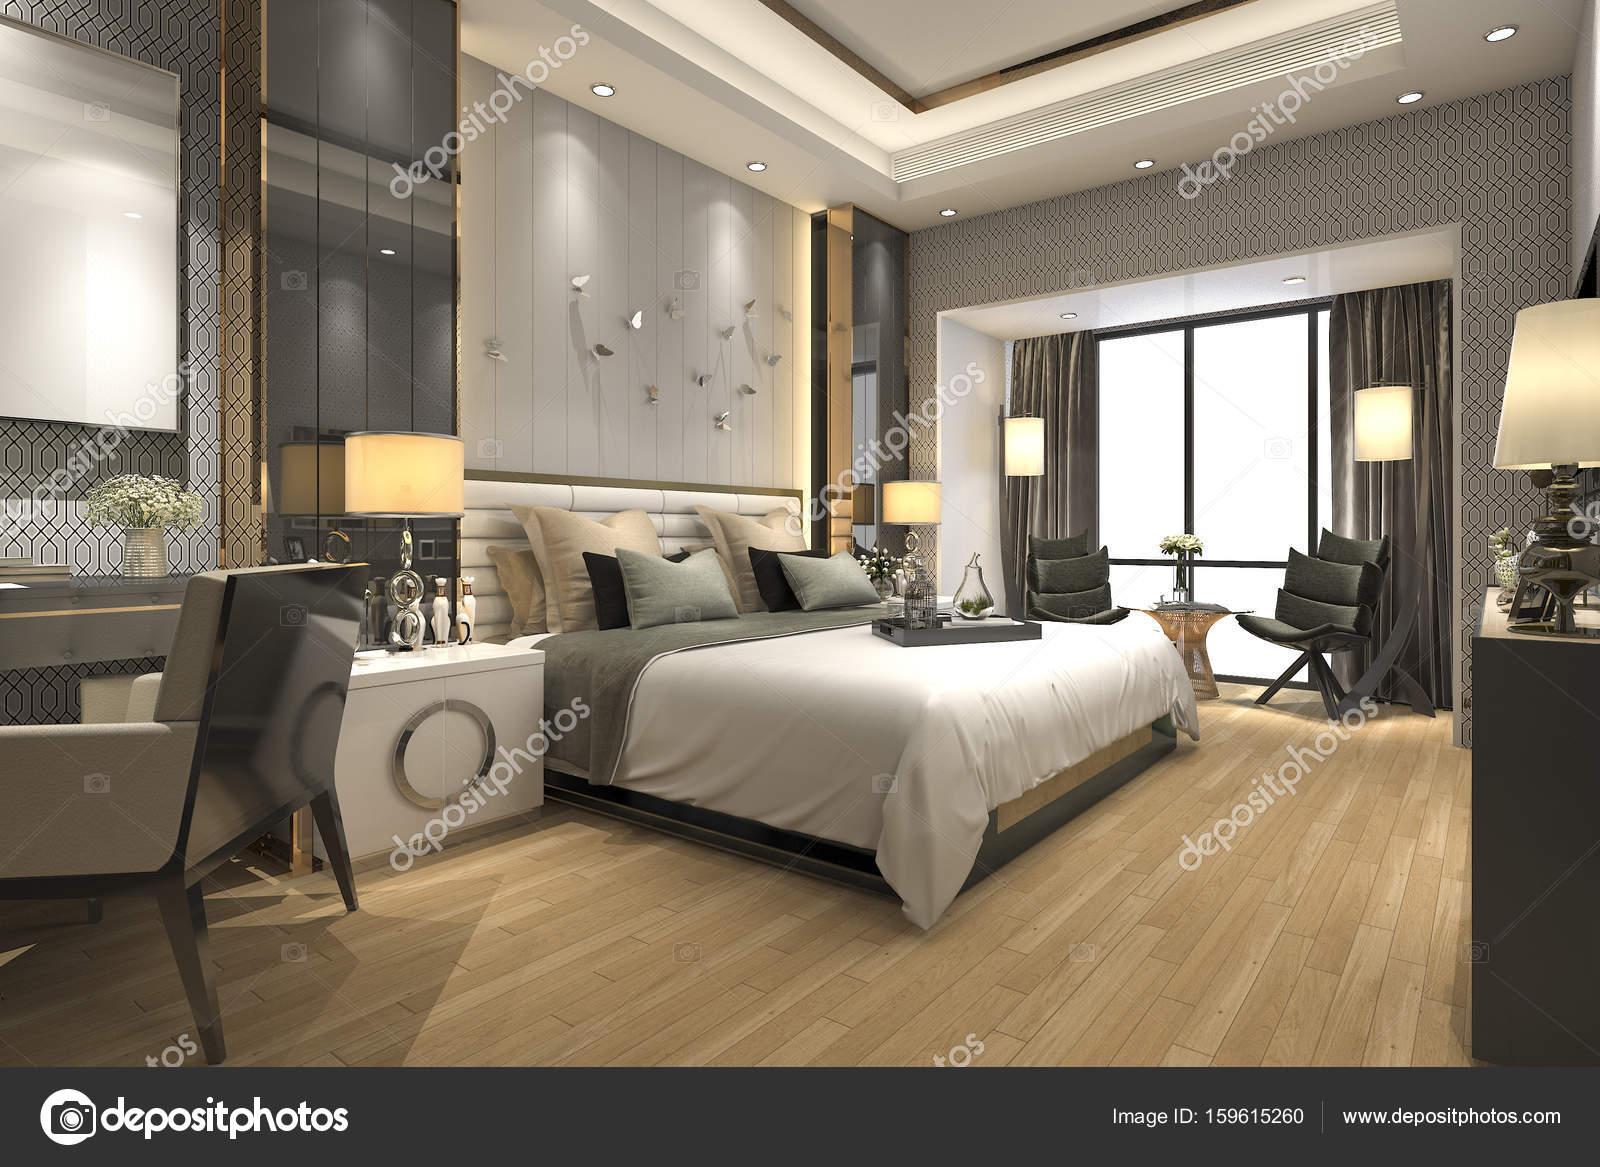 Slaapkamer En Suite : 3d rendering luxe moderne slaapkamer suite in hotel u2014 stockfoto